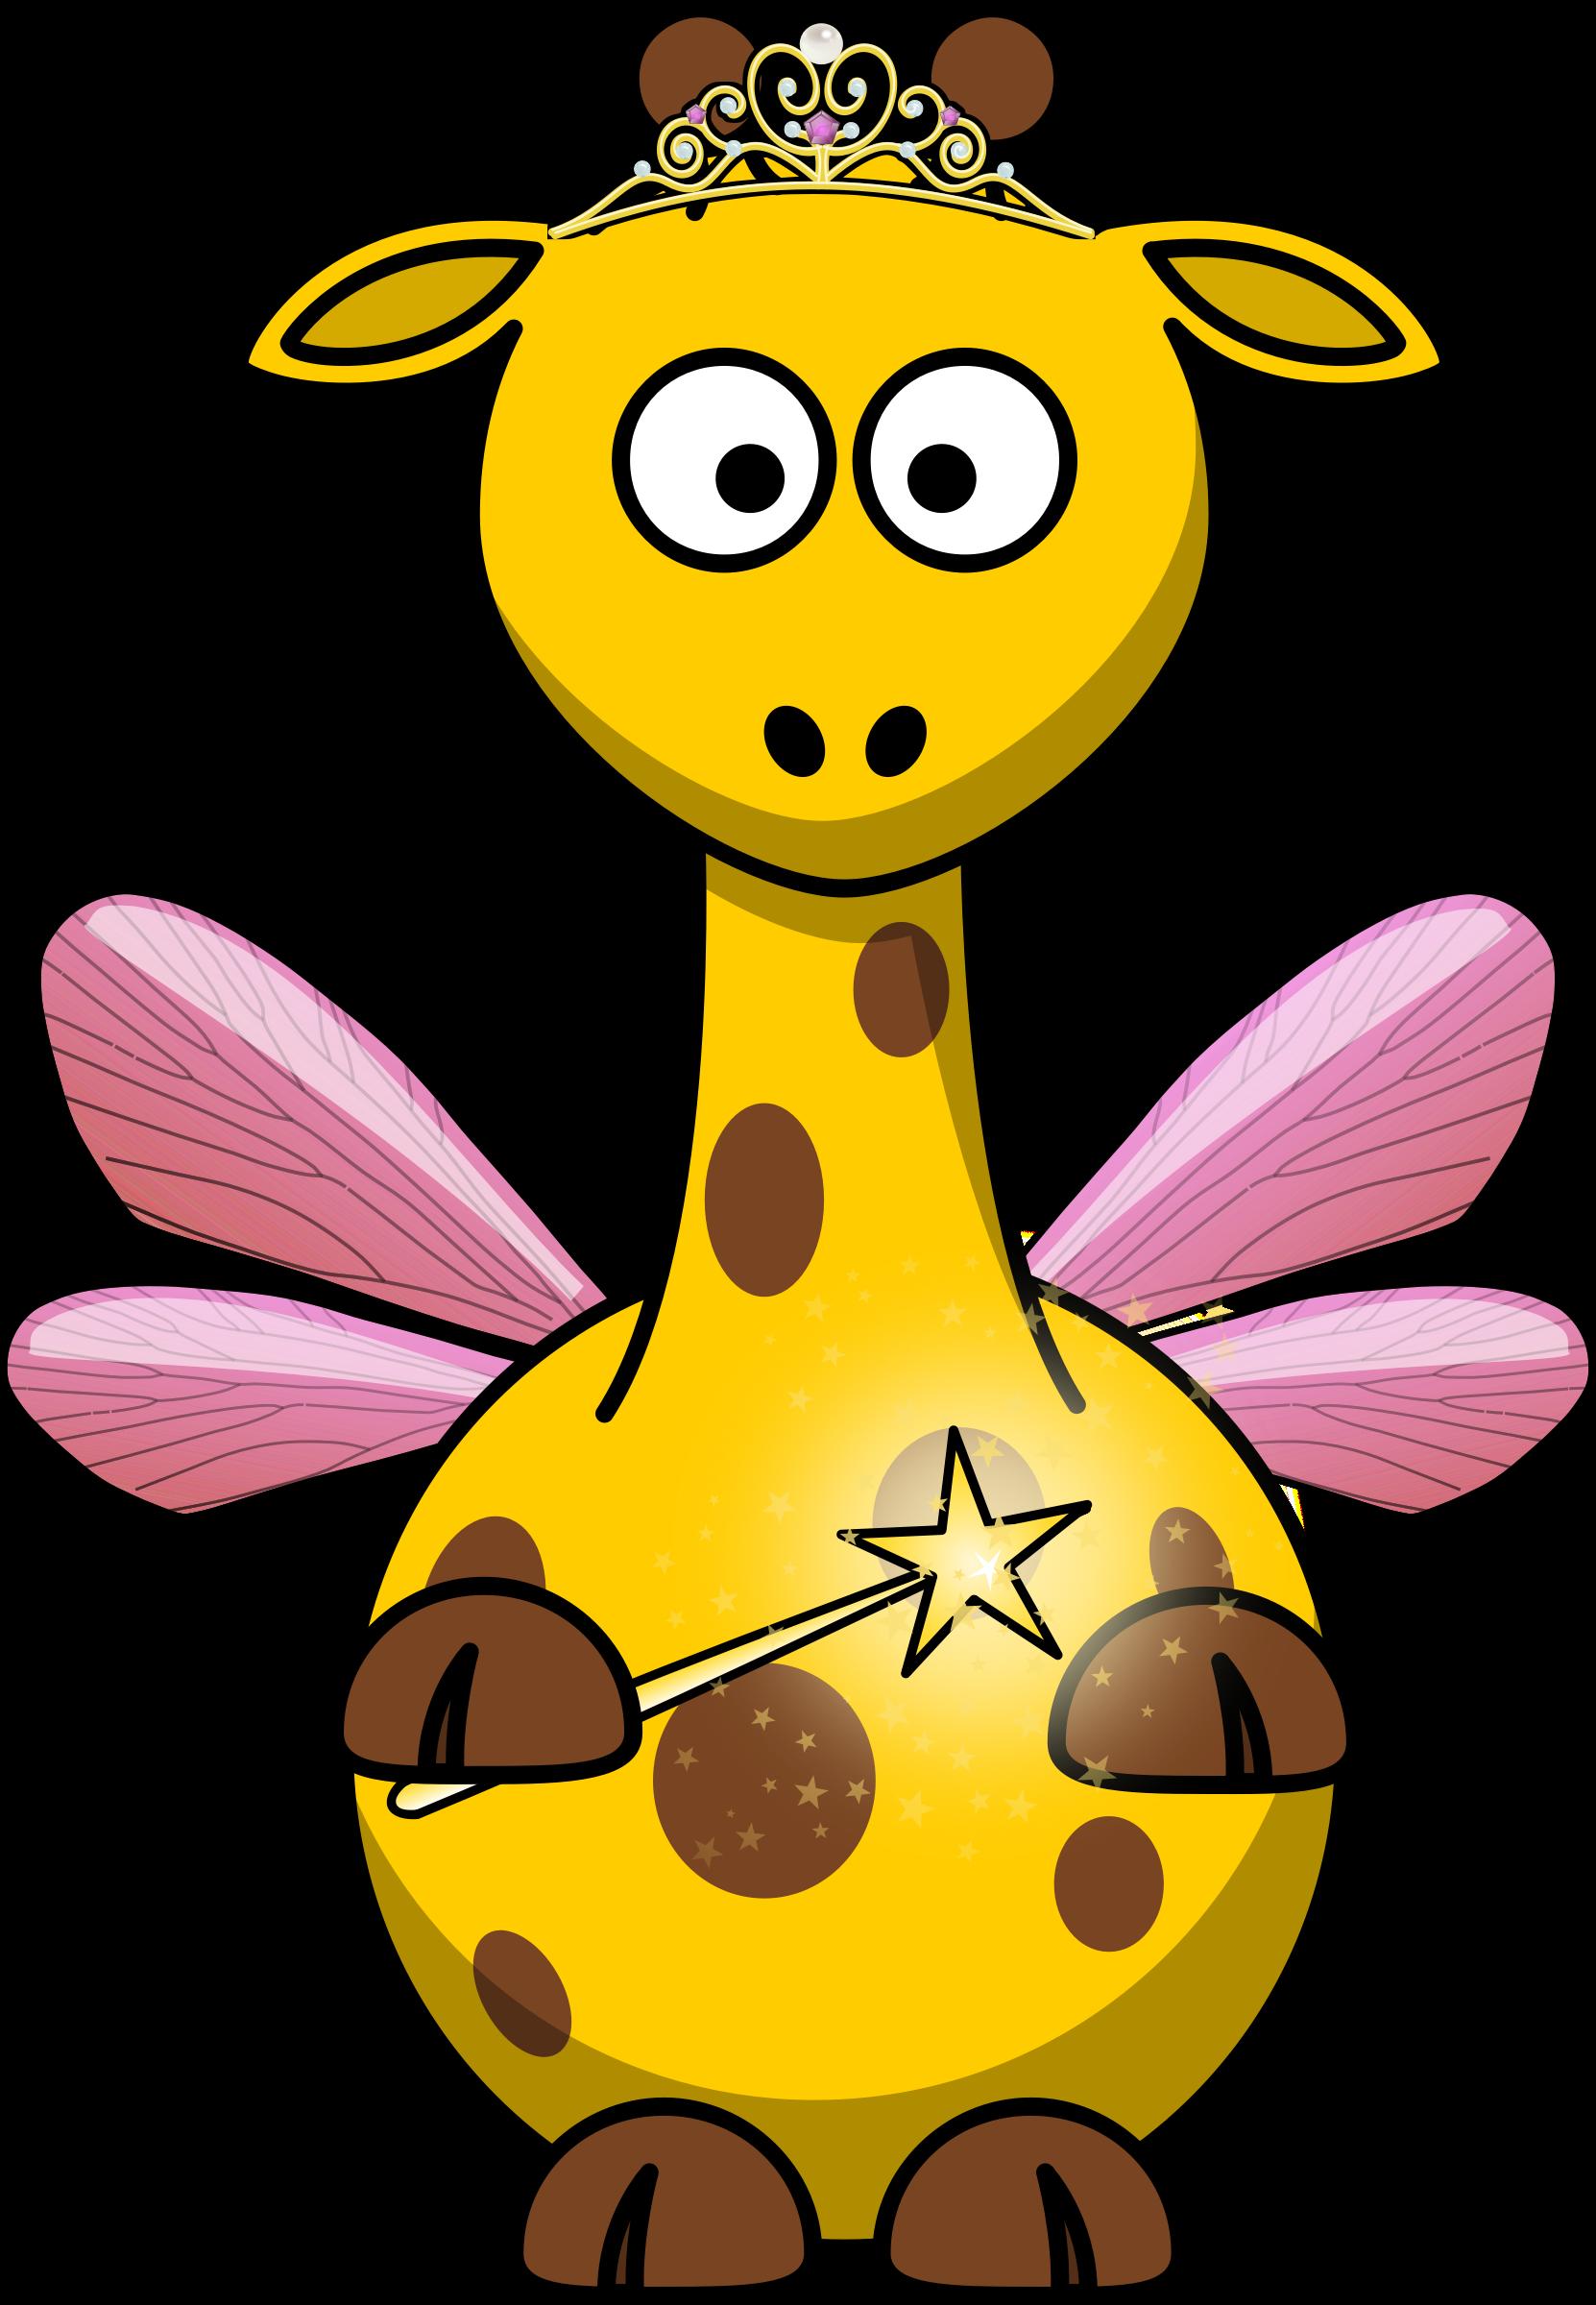 Fairy clipart love. Giraffe big image png